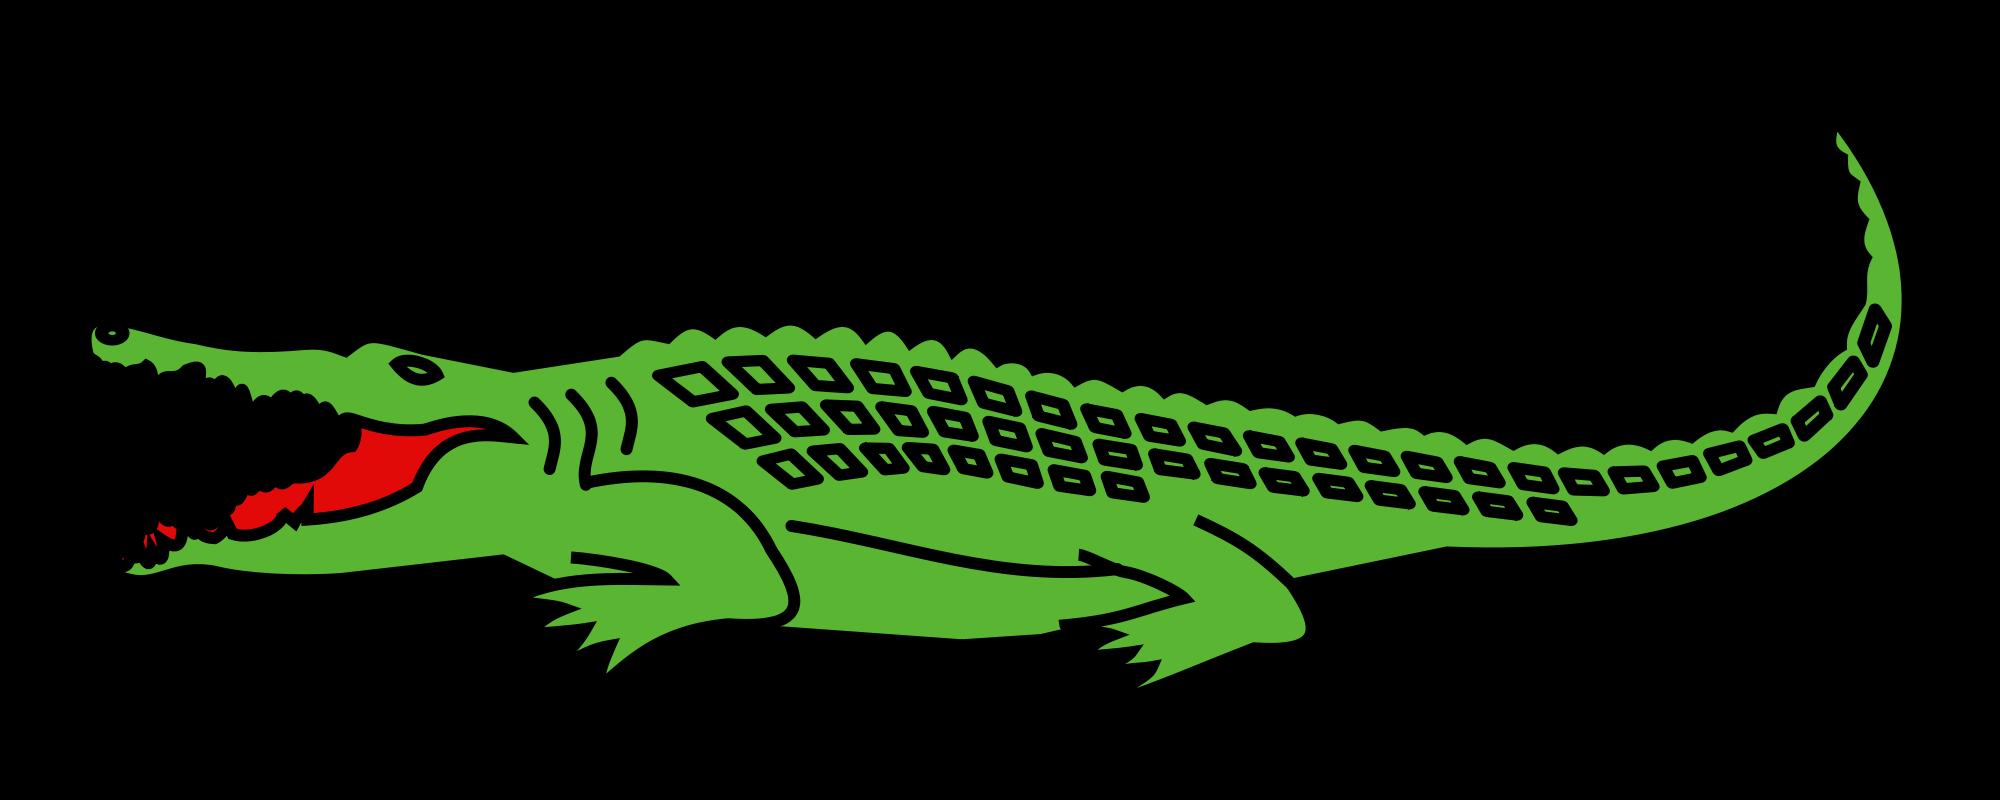 clipart transparent stock File h raldique meuble. Vector wiki crocodile